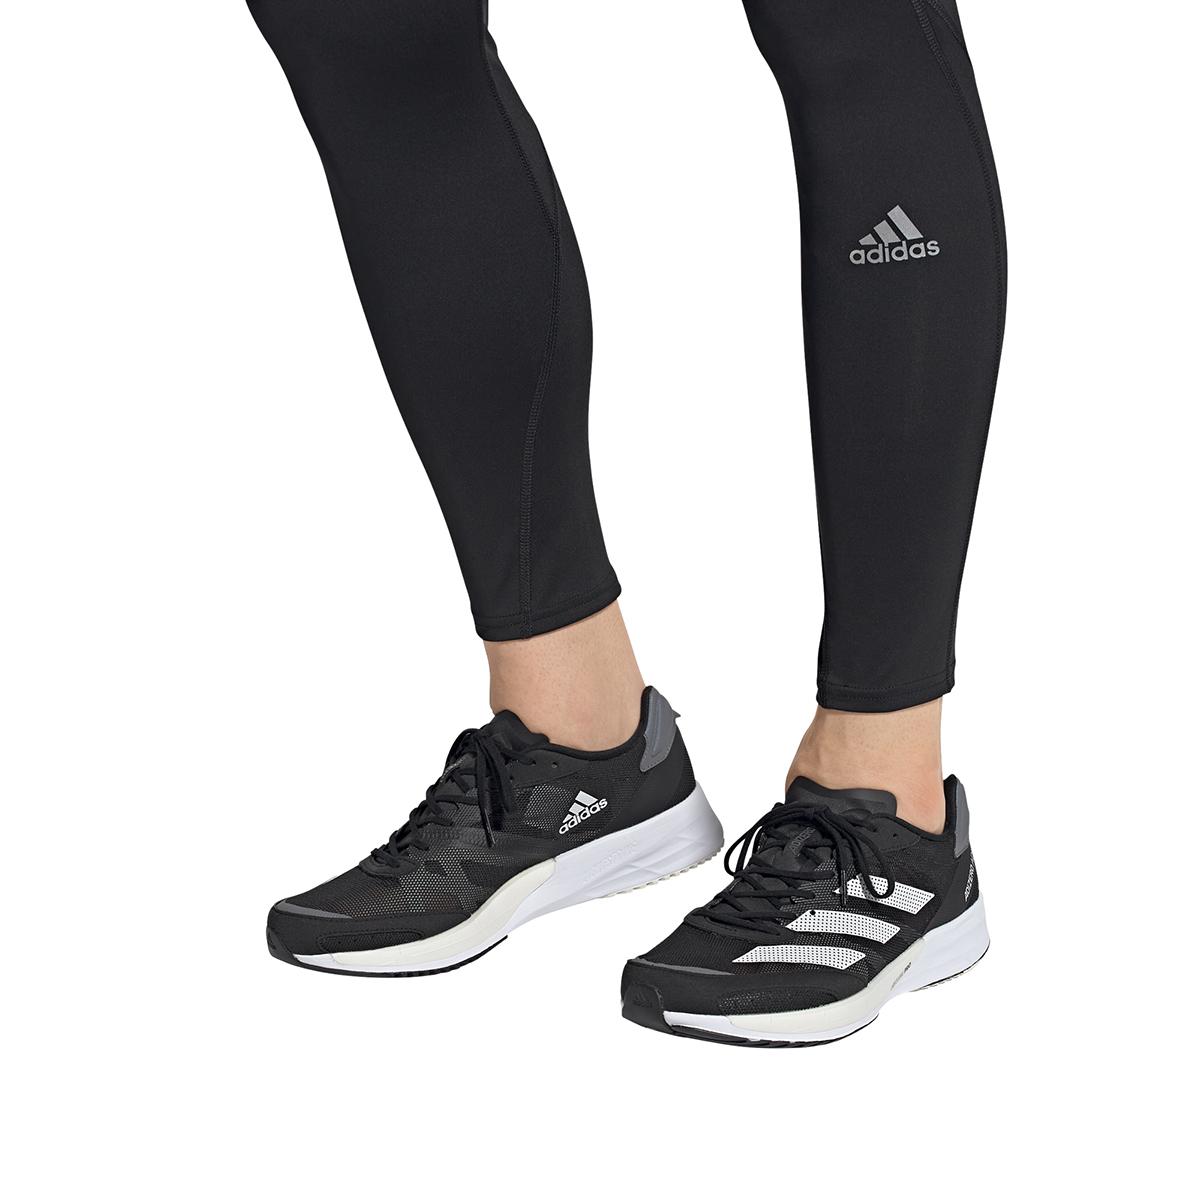 Men's Adidas Adizero Adios 6 Running Shoe - Color: Black/White/Grey - Size: 6 - Width: Regular, Black/White/Grey, large, image 5